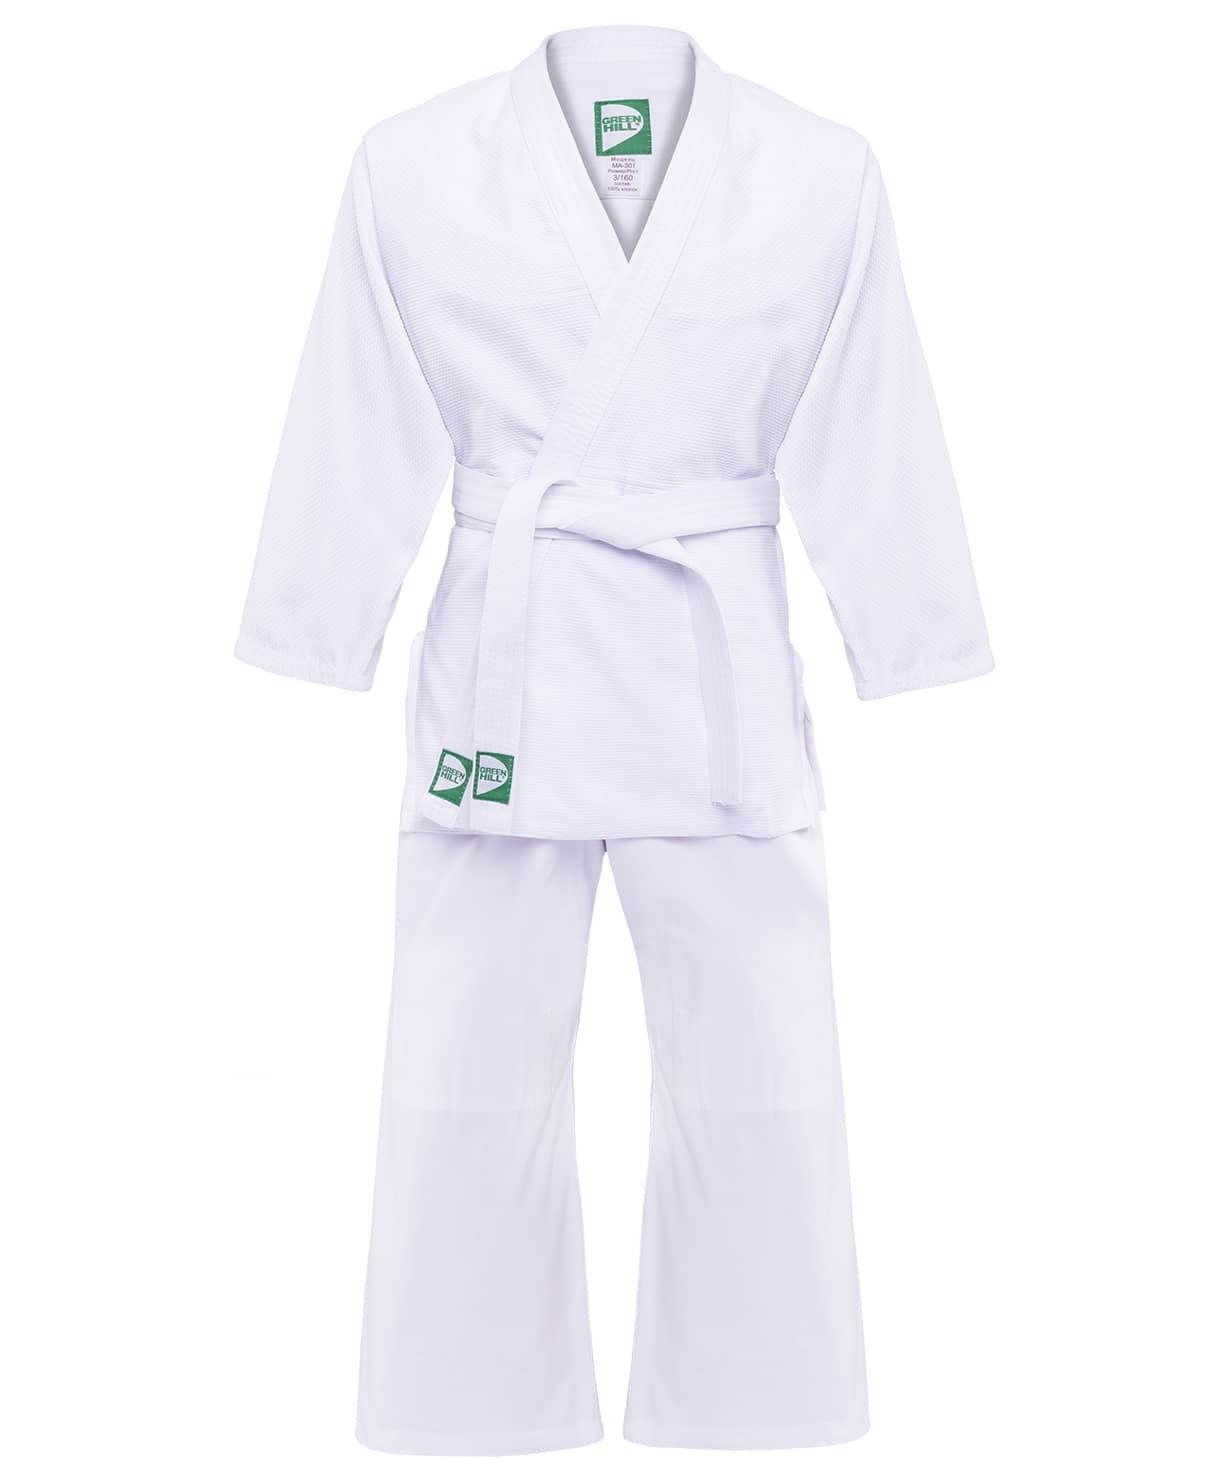 Кимоно для дзюдо MA-301 белый, р.00/120